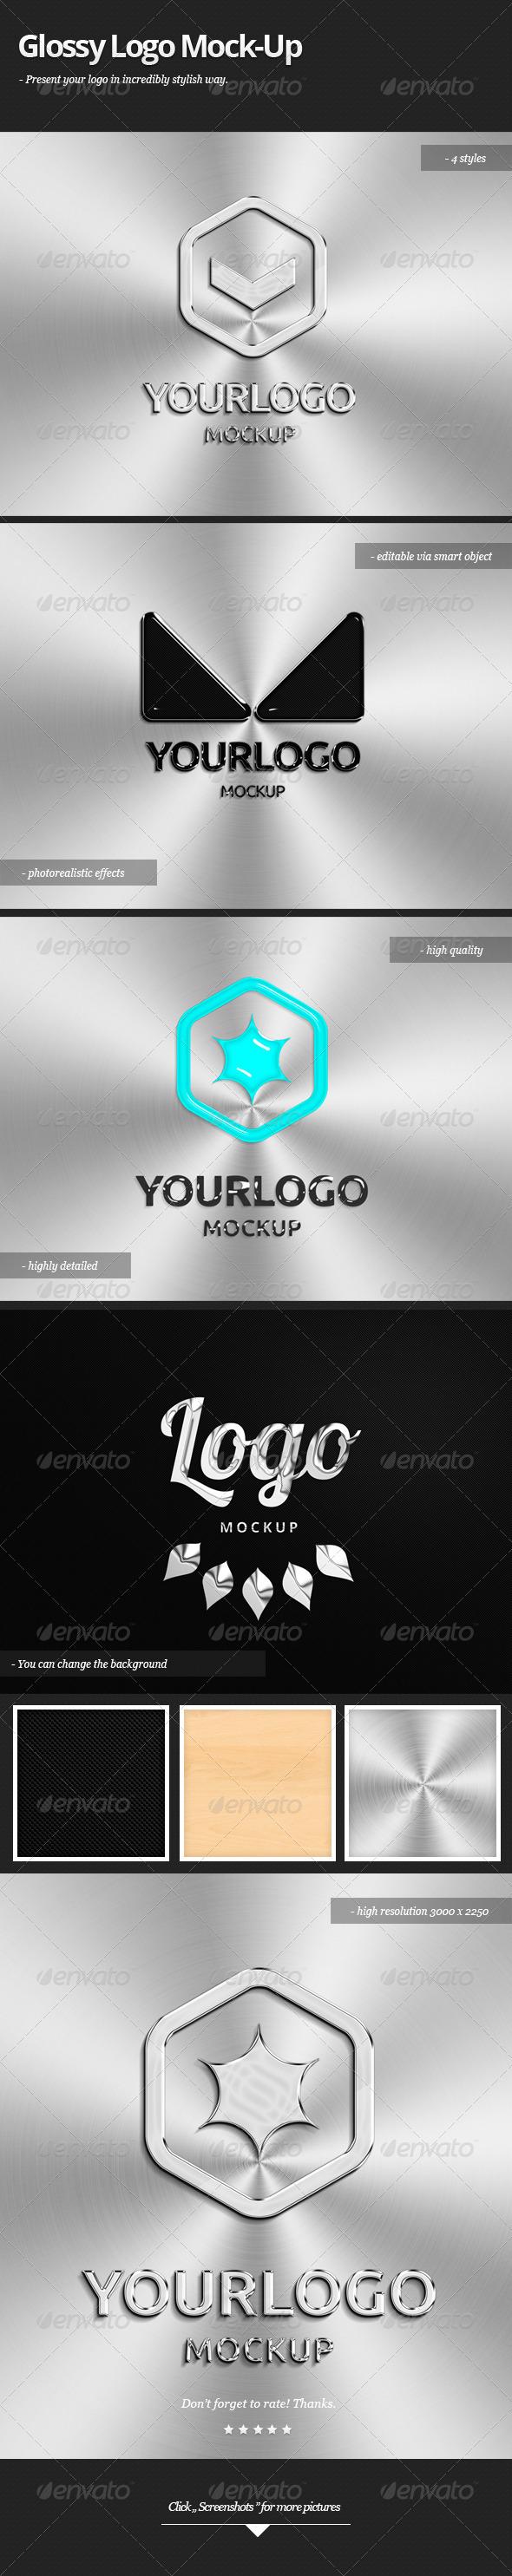 Glossy Logo Mock-up - Logo Product Mock-Ups